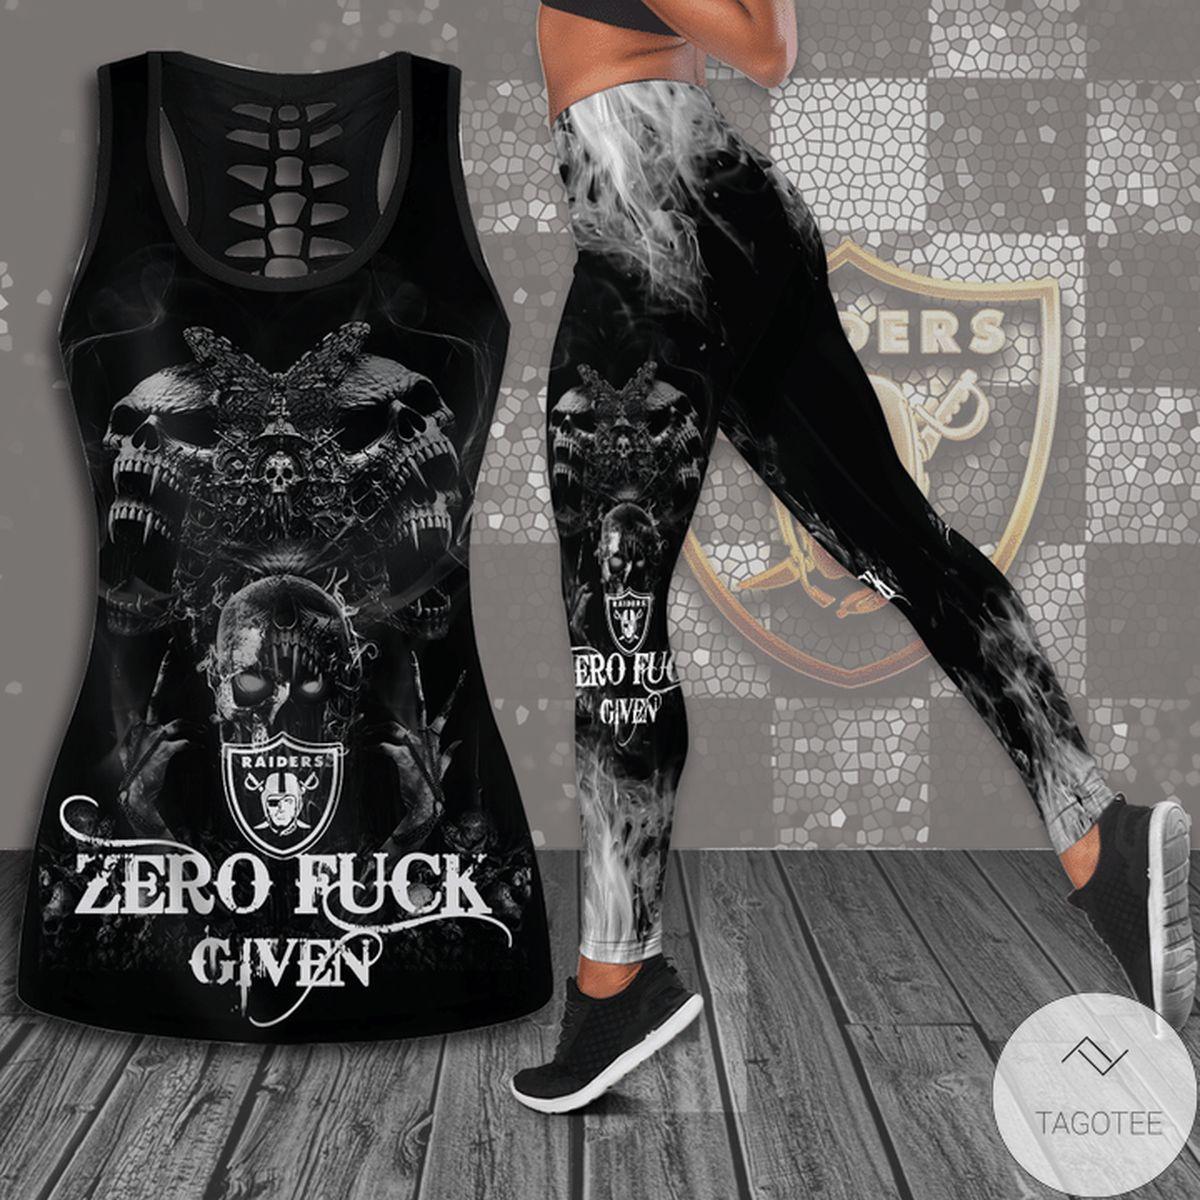 Zero Fuck Given Las Vegas Raiders Hollow Tank Top & Leggings Set